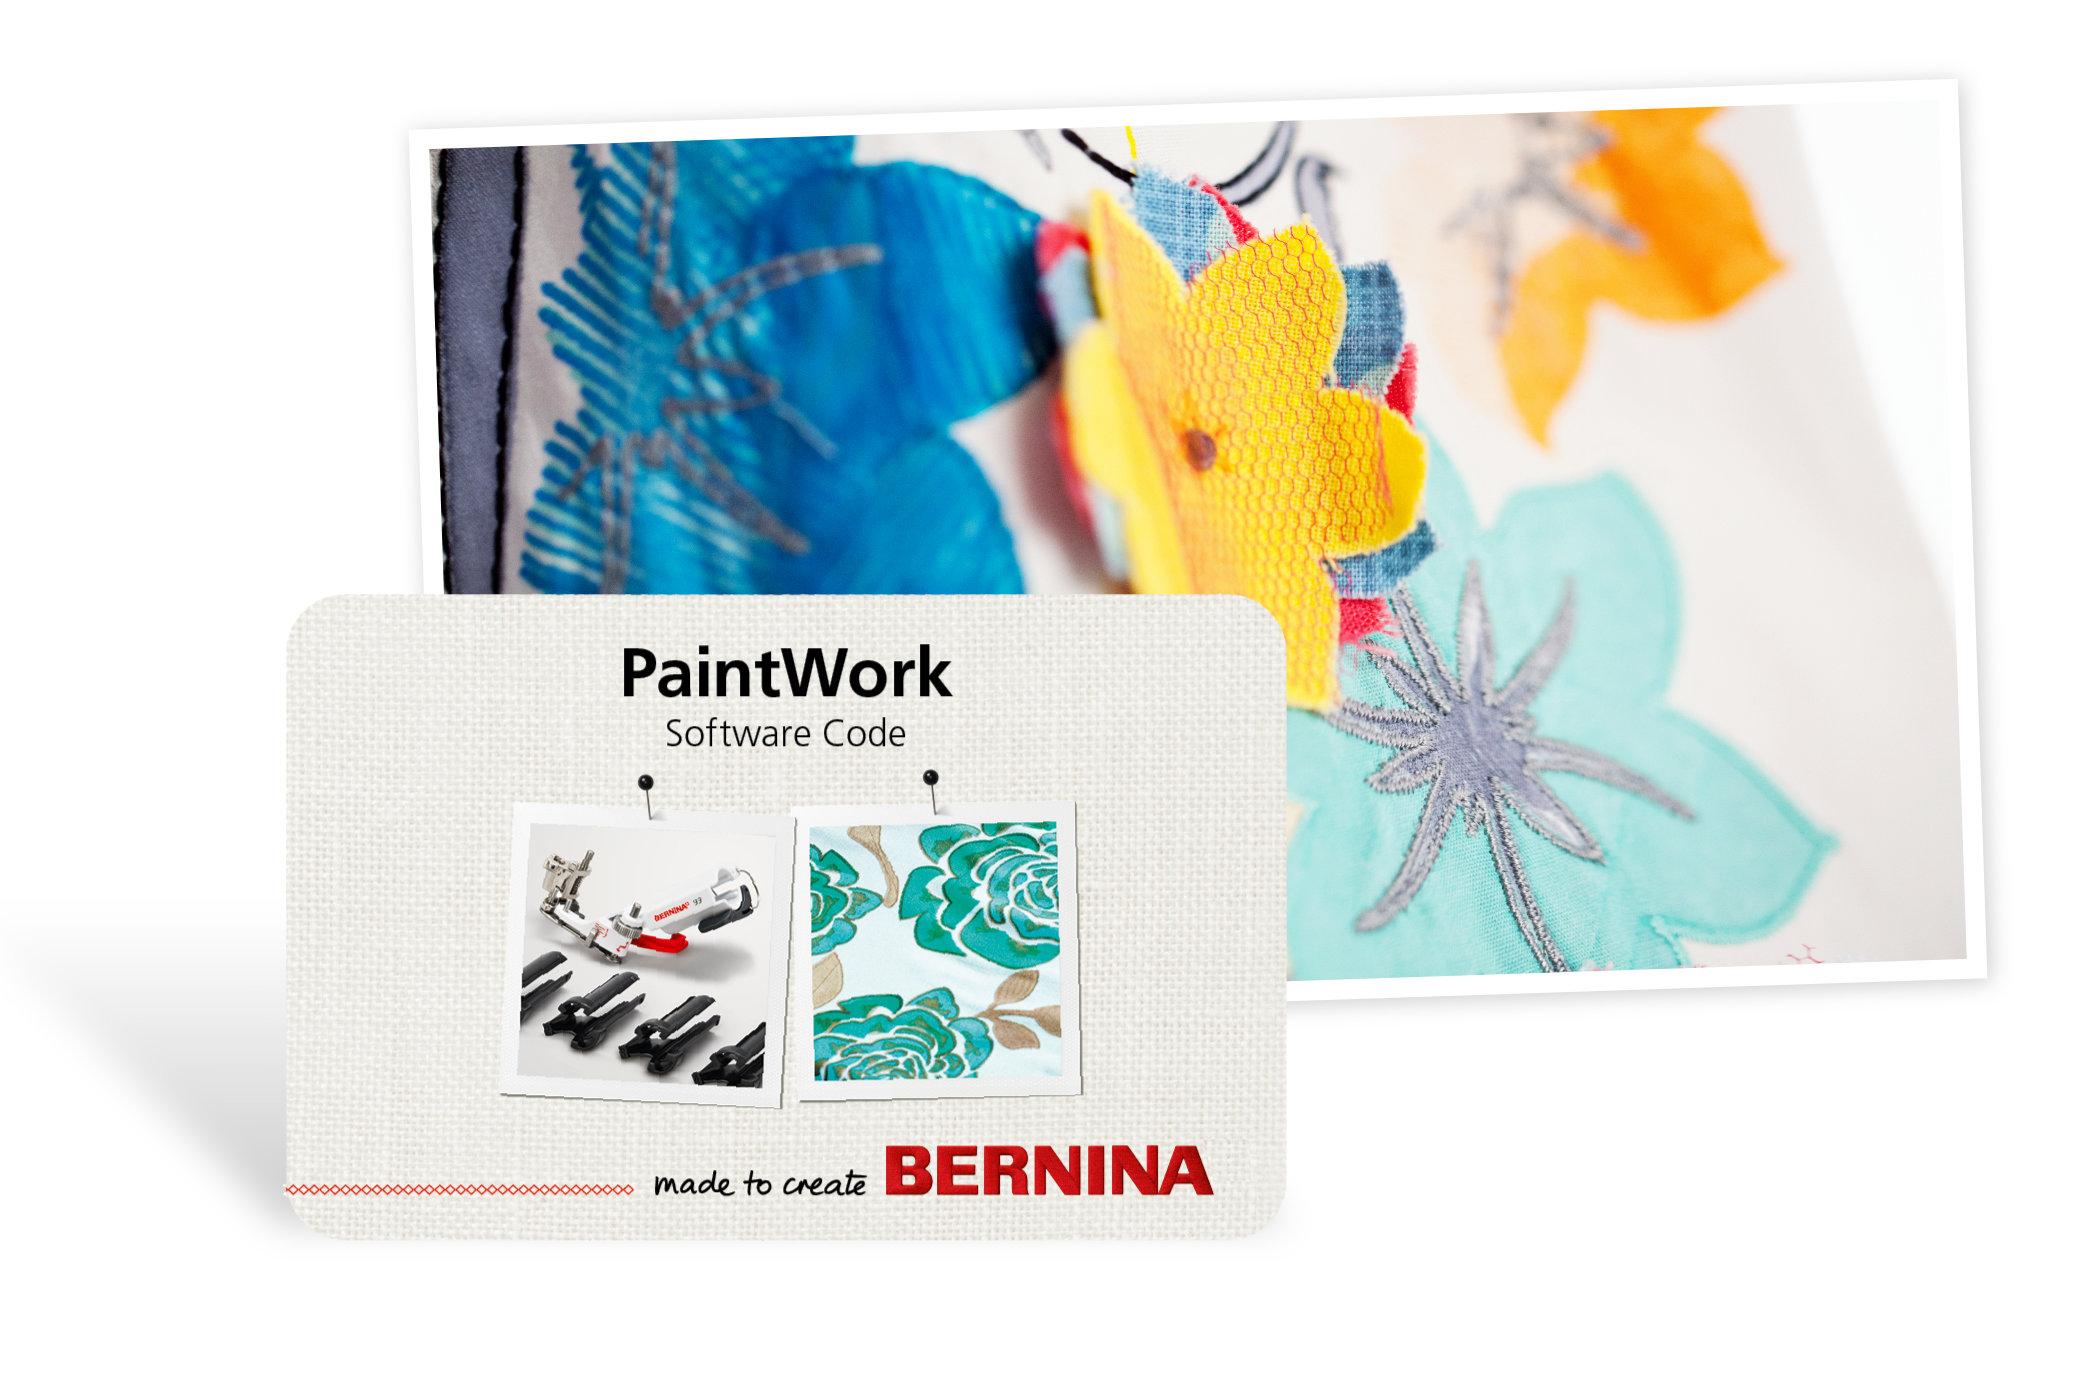 BERNINA PaintWork: Creative Design Tool